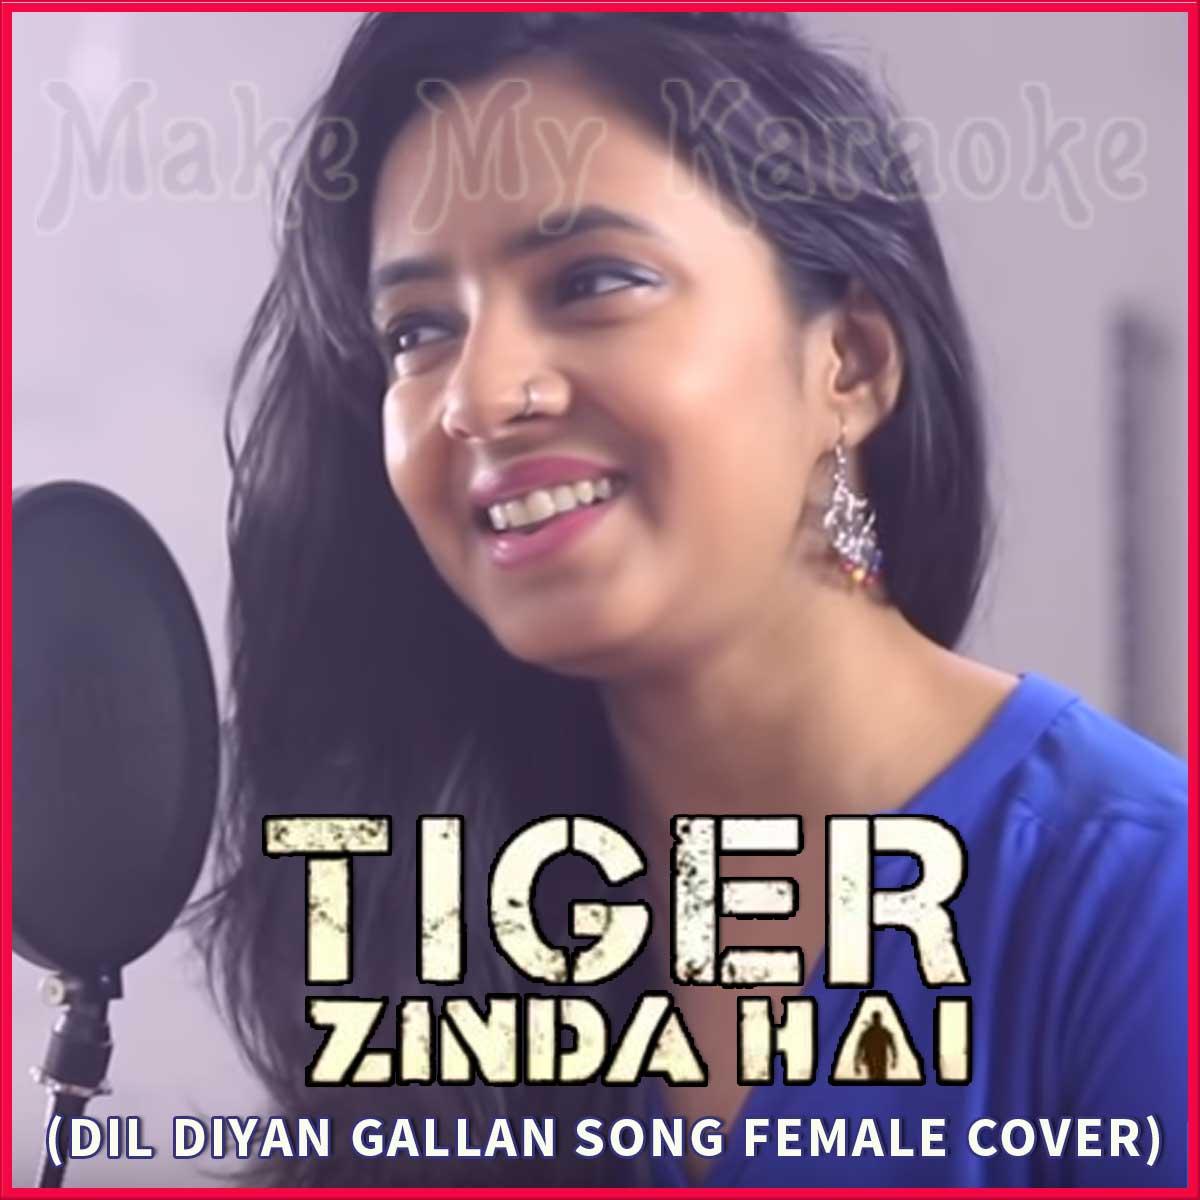 Dil Diyan Gallan Song Female Cover Tiger Zinda Hai Mp3 Format